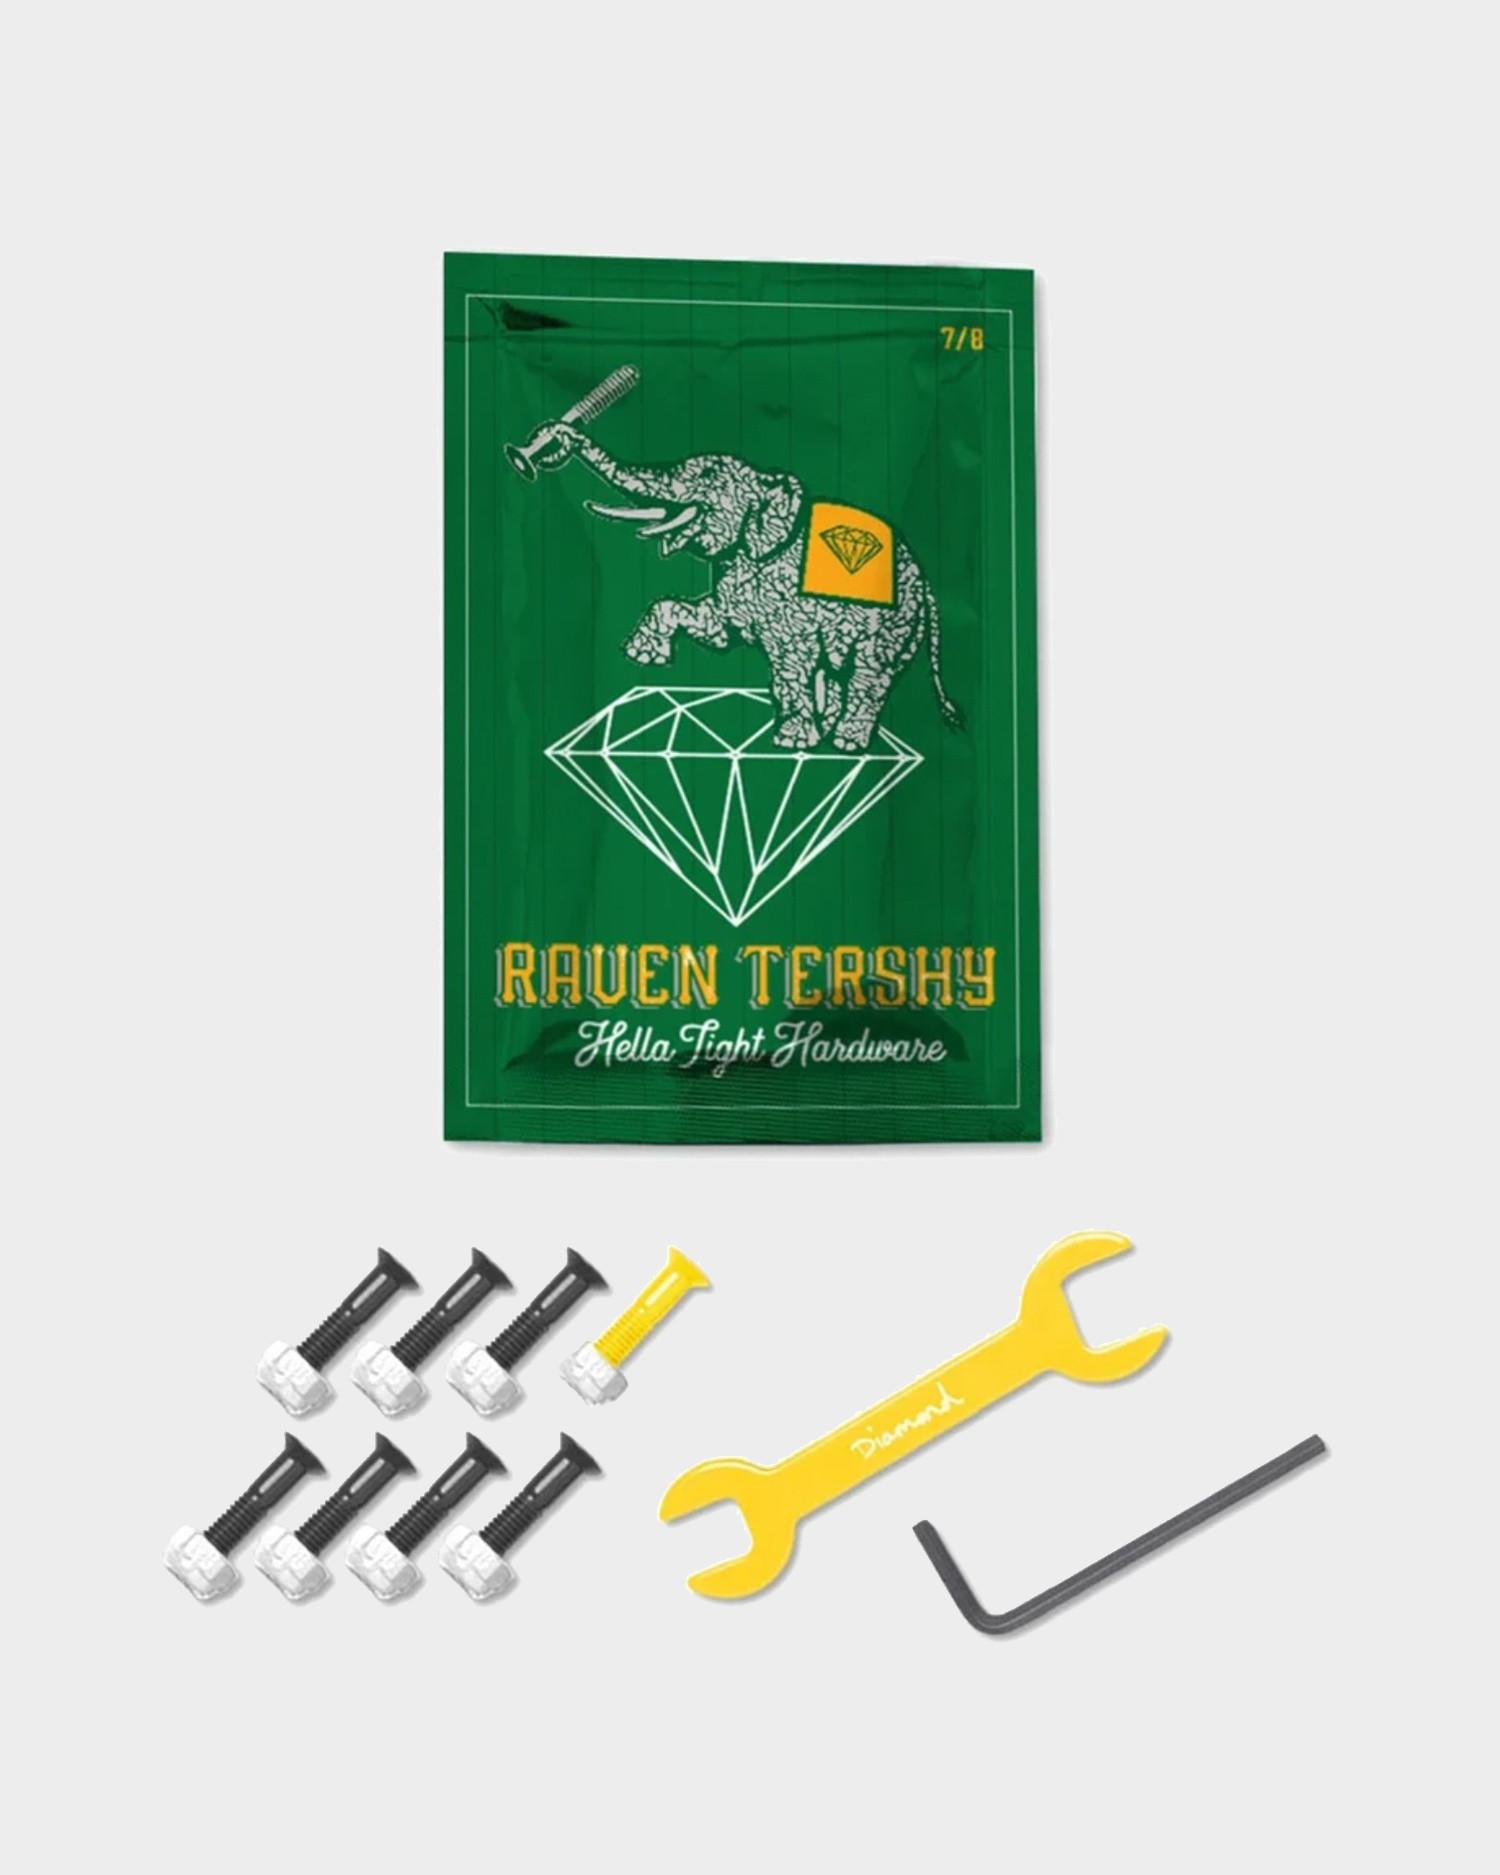 Diamond Bolts Raven Tershy Pro Hardware 7/8 inch Yellow